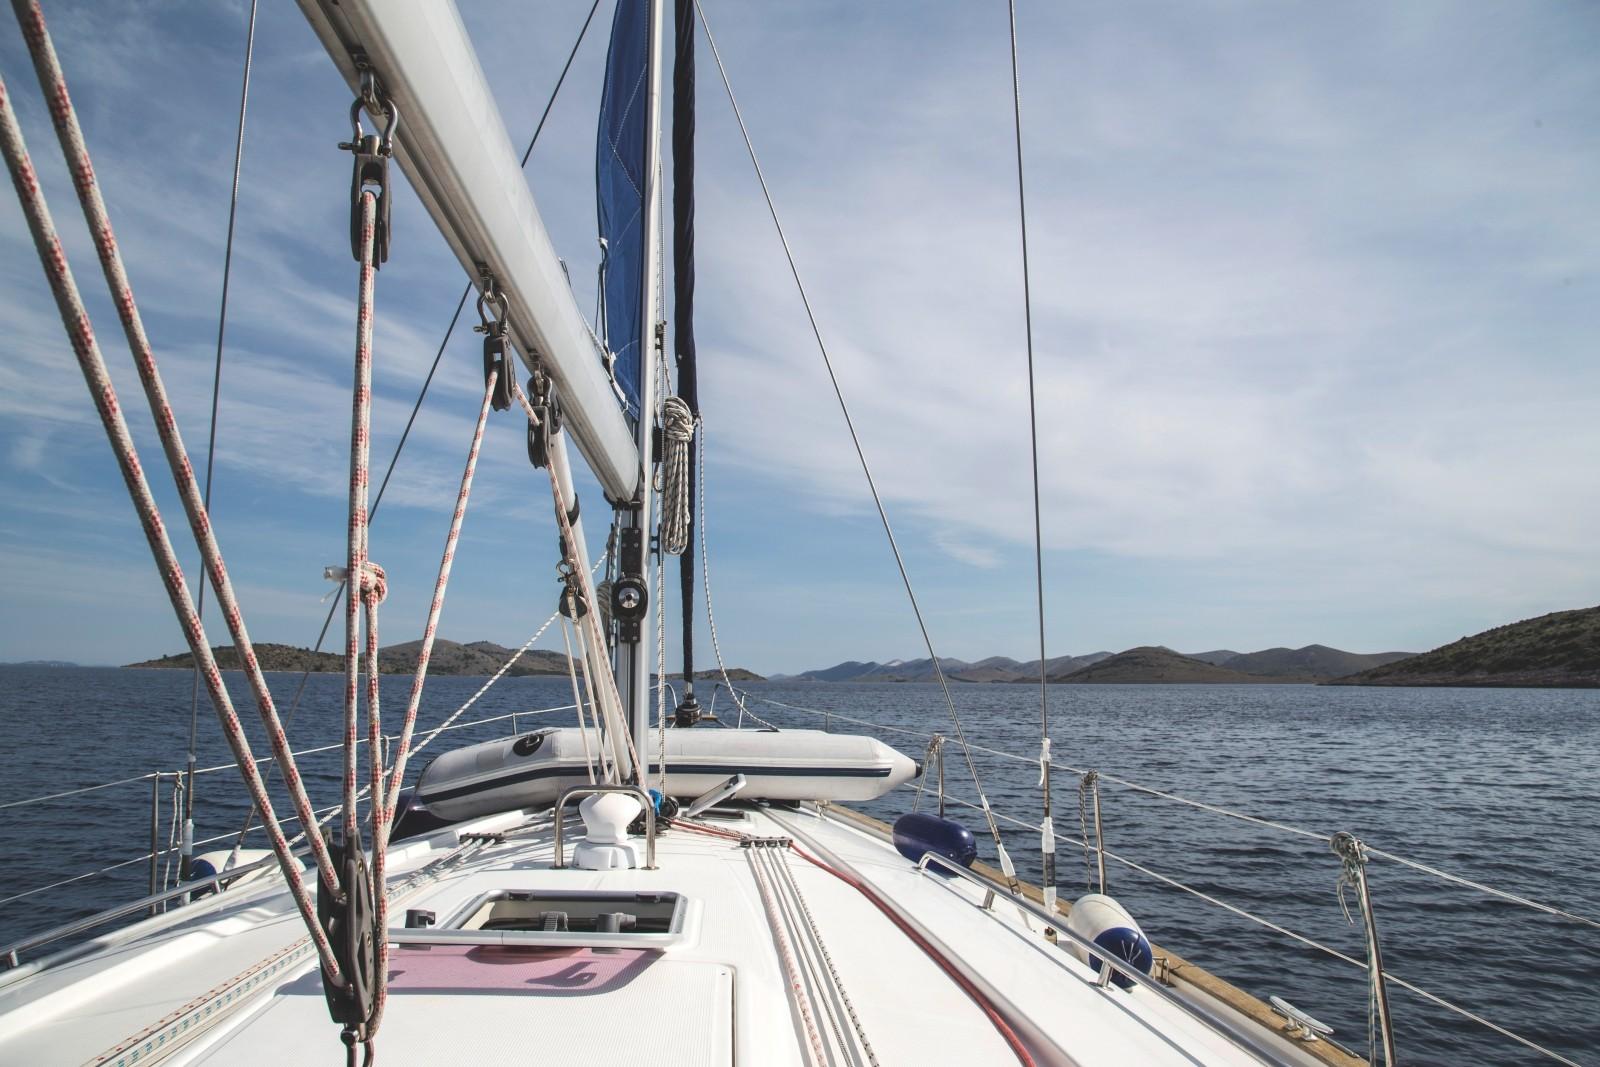 sailboat-boat-sailing-yacht-islands-croatia-sky